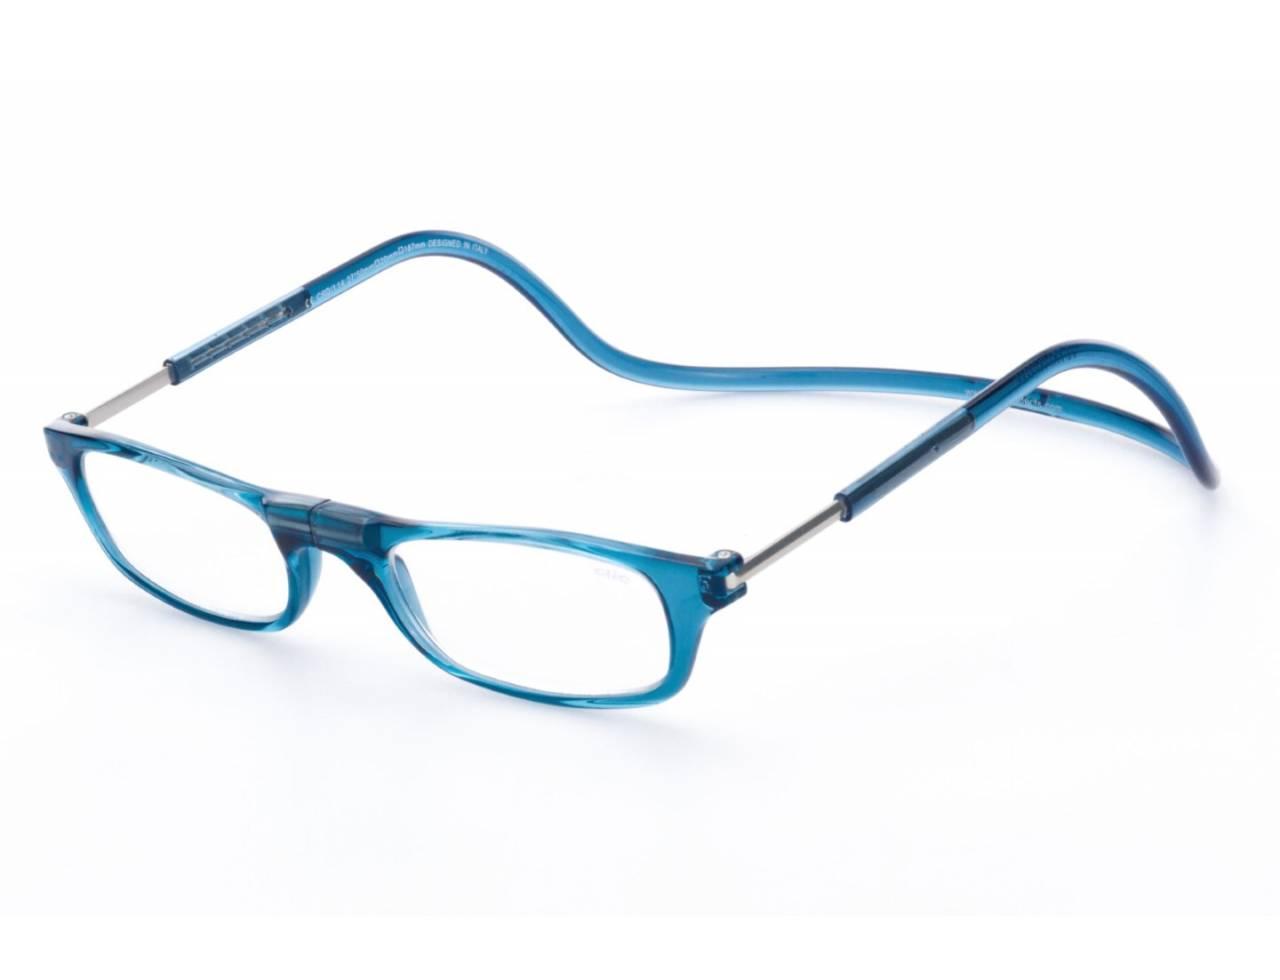 Очки CliC Vision Blue Jean - Фото №7